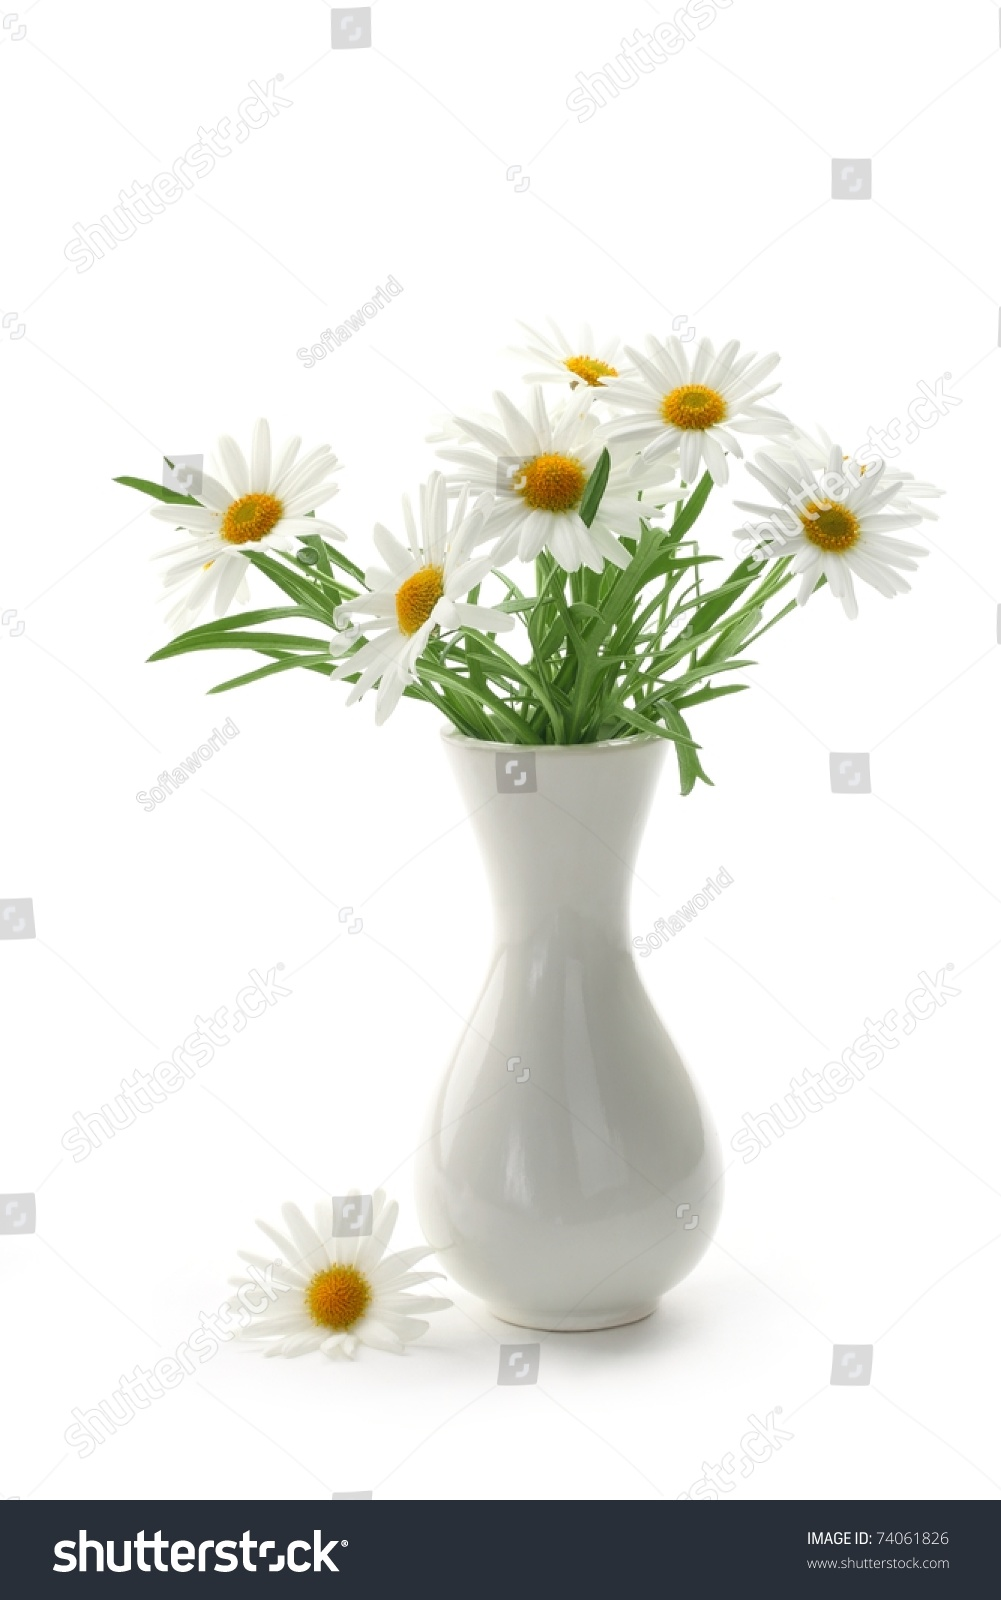 Daisies vase on white background stock photo 74061826 shutterstock daisies in vase on white background reviewsmspy